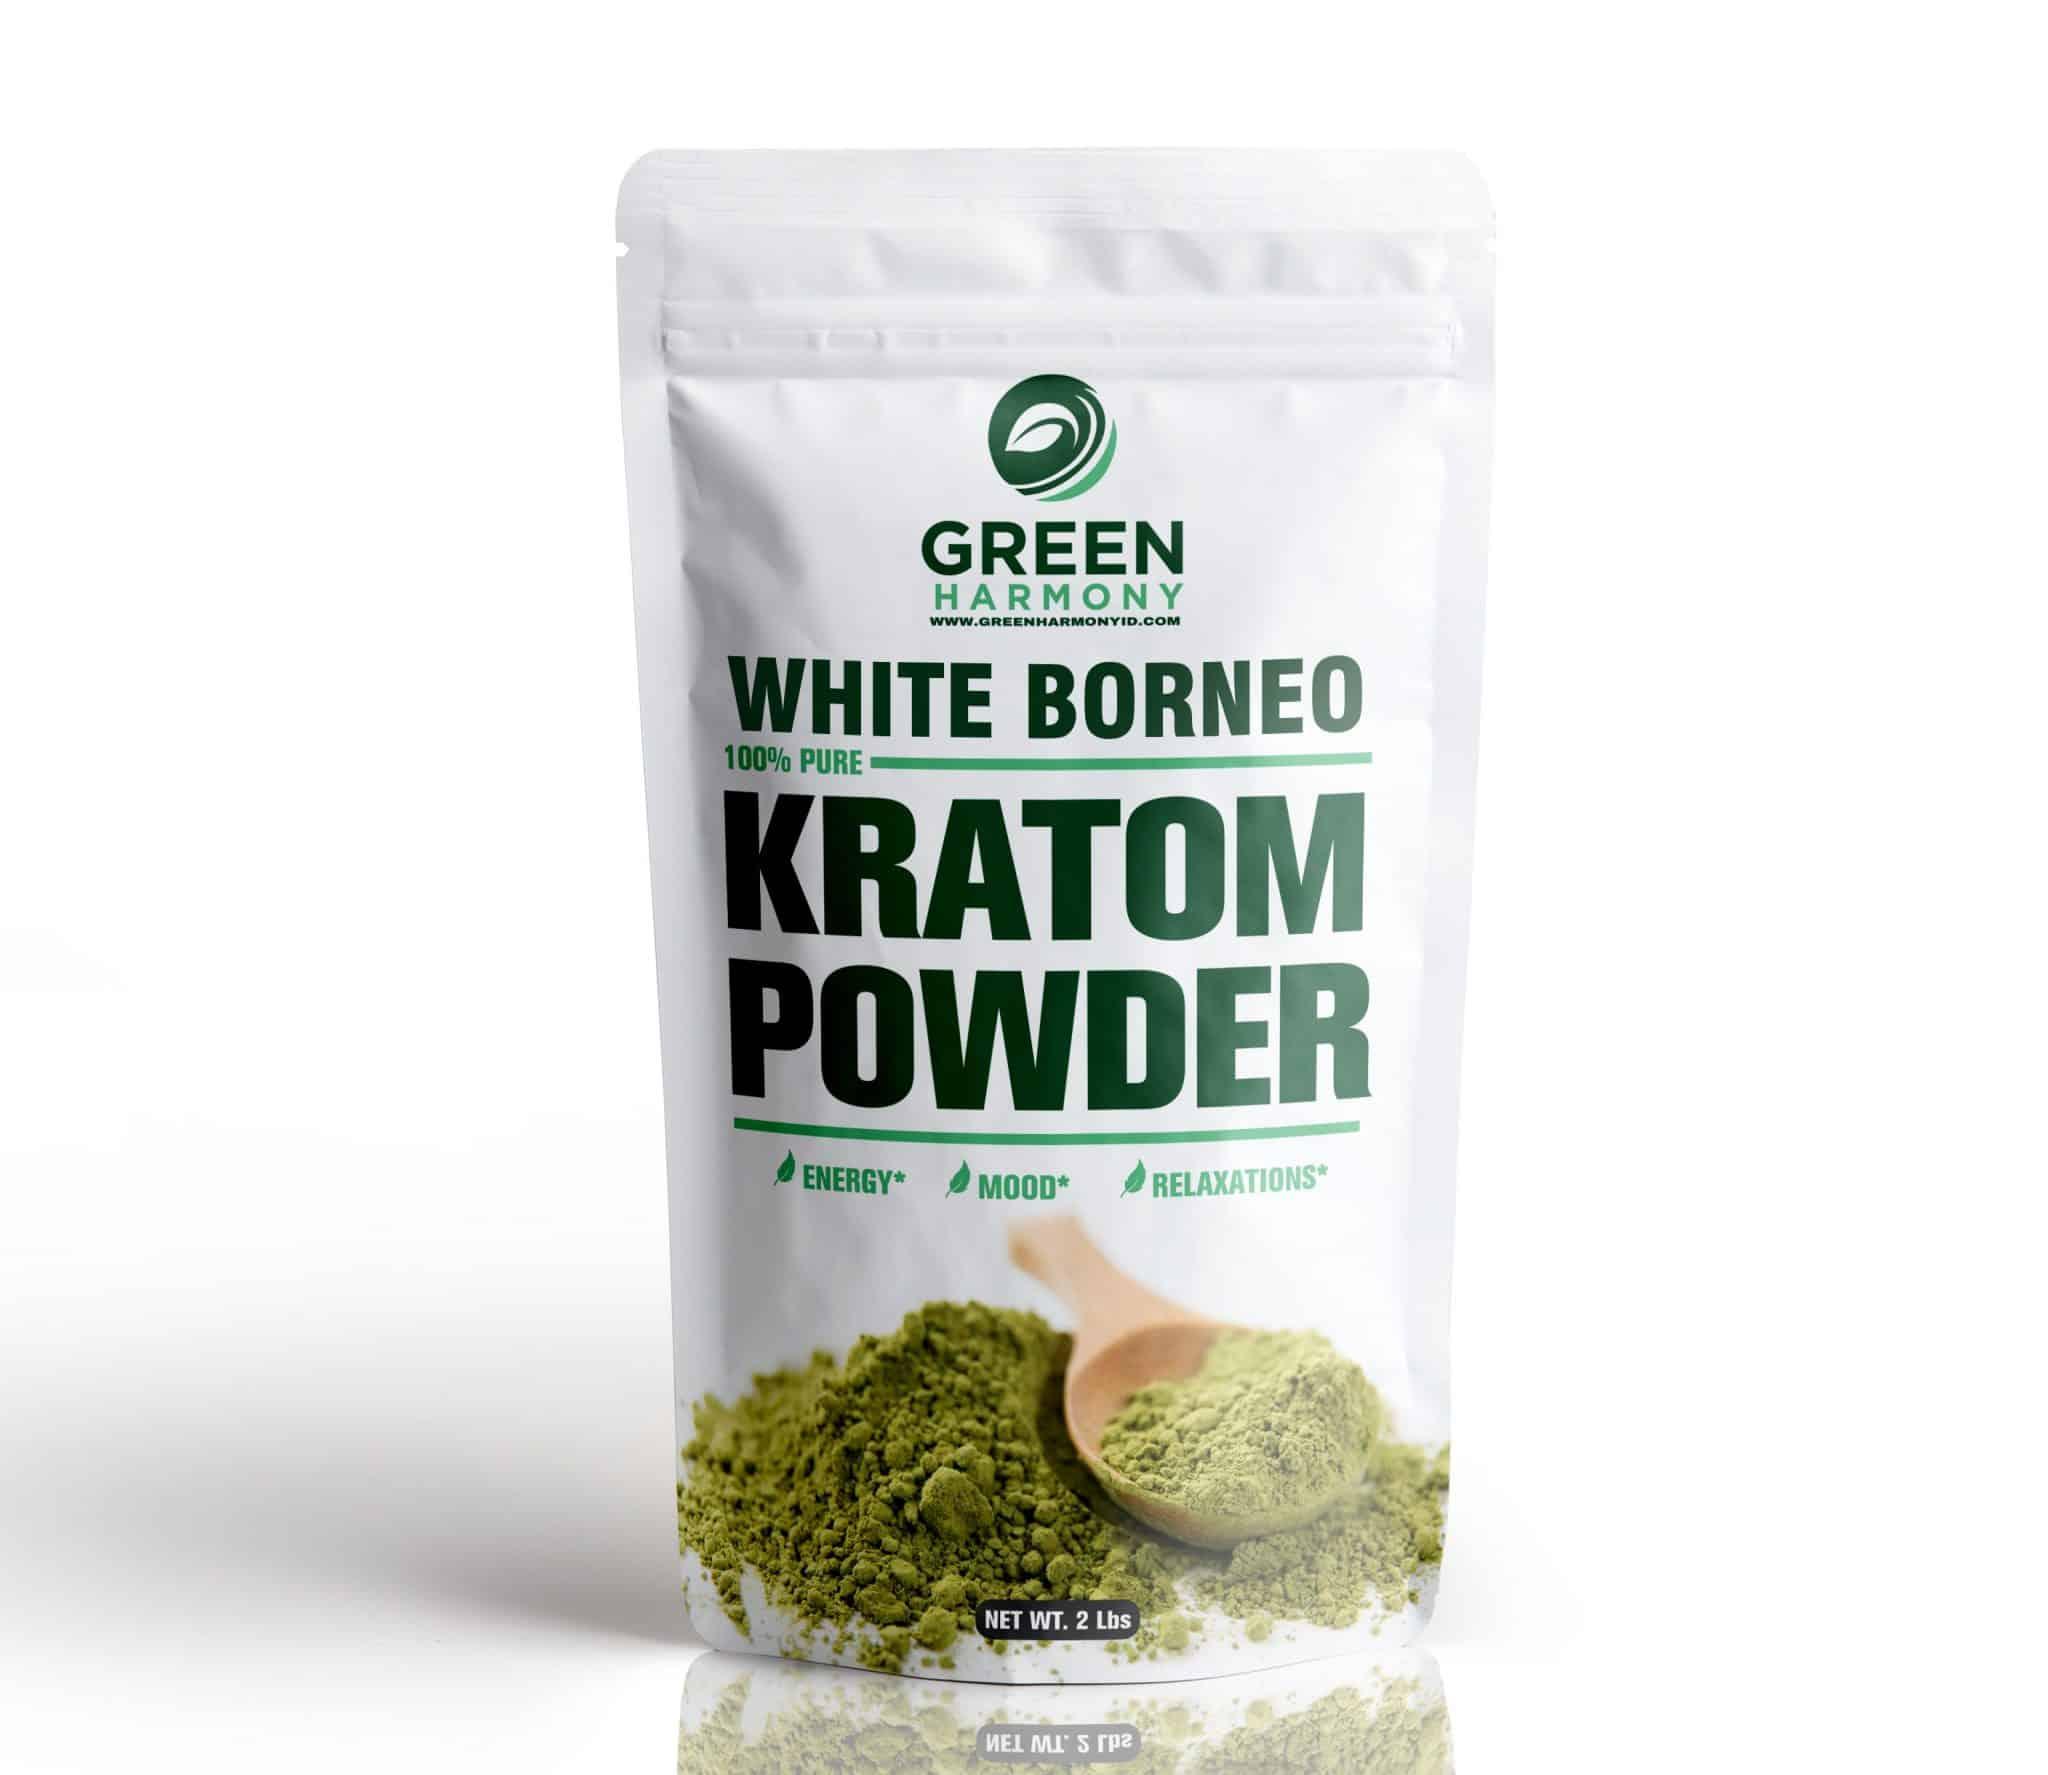 White Borneo Kratom Strains - Green Harmony Indonesia Kratom Vendor - Ensured Delivery